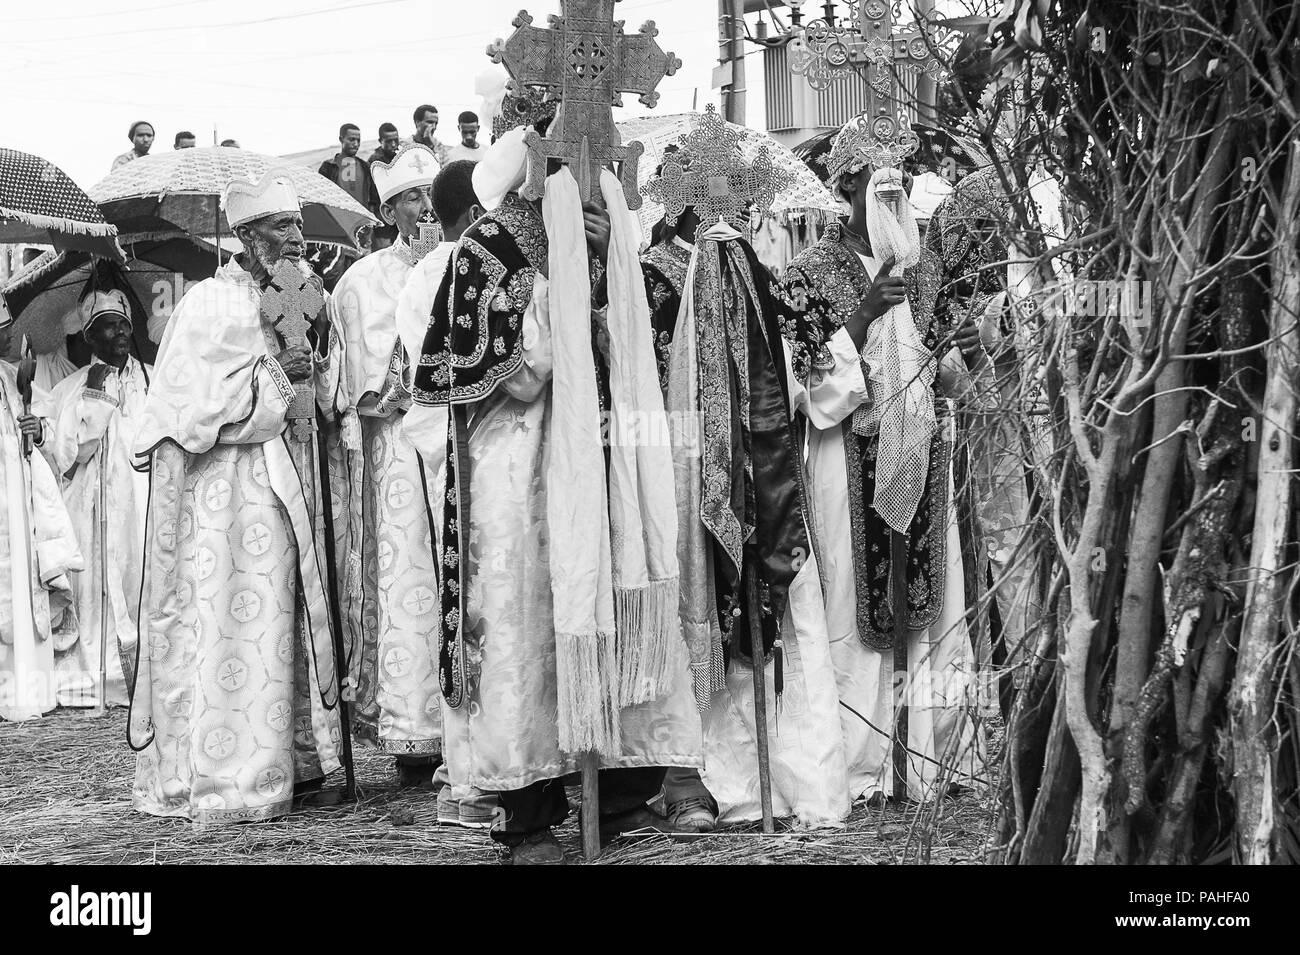 LALIBELA, ETHIOPIA - SEP 27, 2011: Unidentified Ethiopian religious people during the Meskel festival in Ehtiopia, Sep 27, 2011. Meskel commemorates t - Stock Image